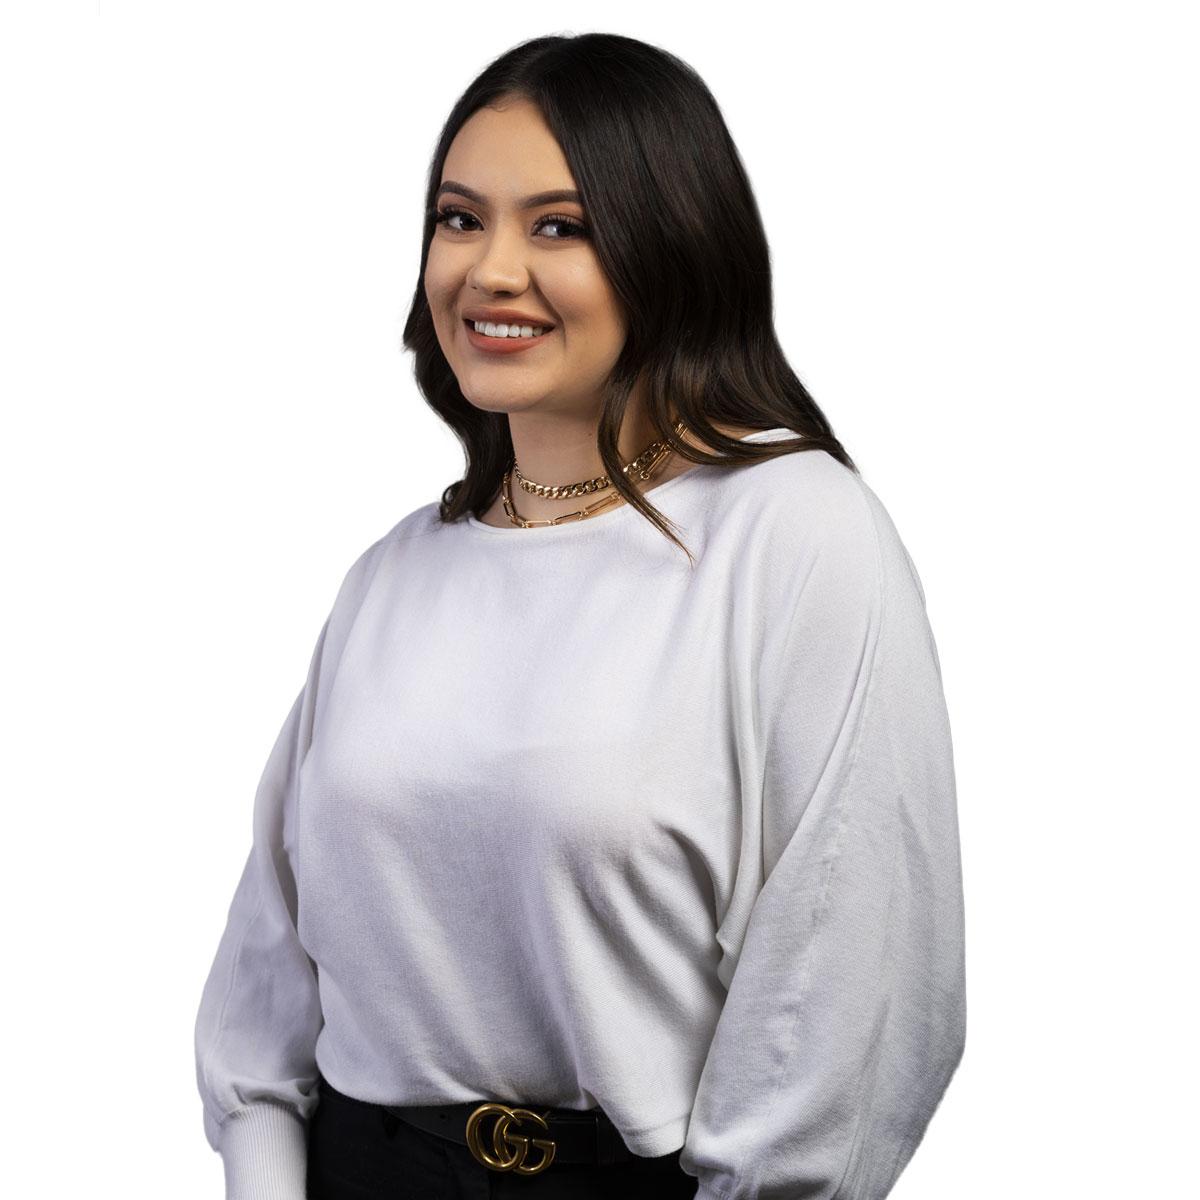 Joanna Rojas